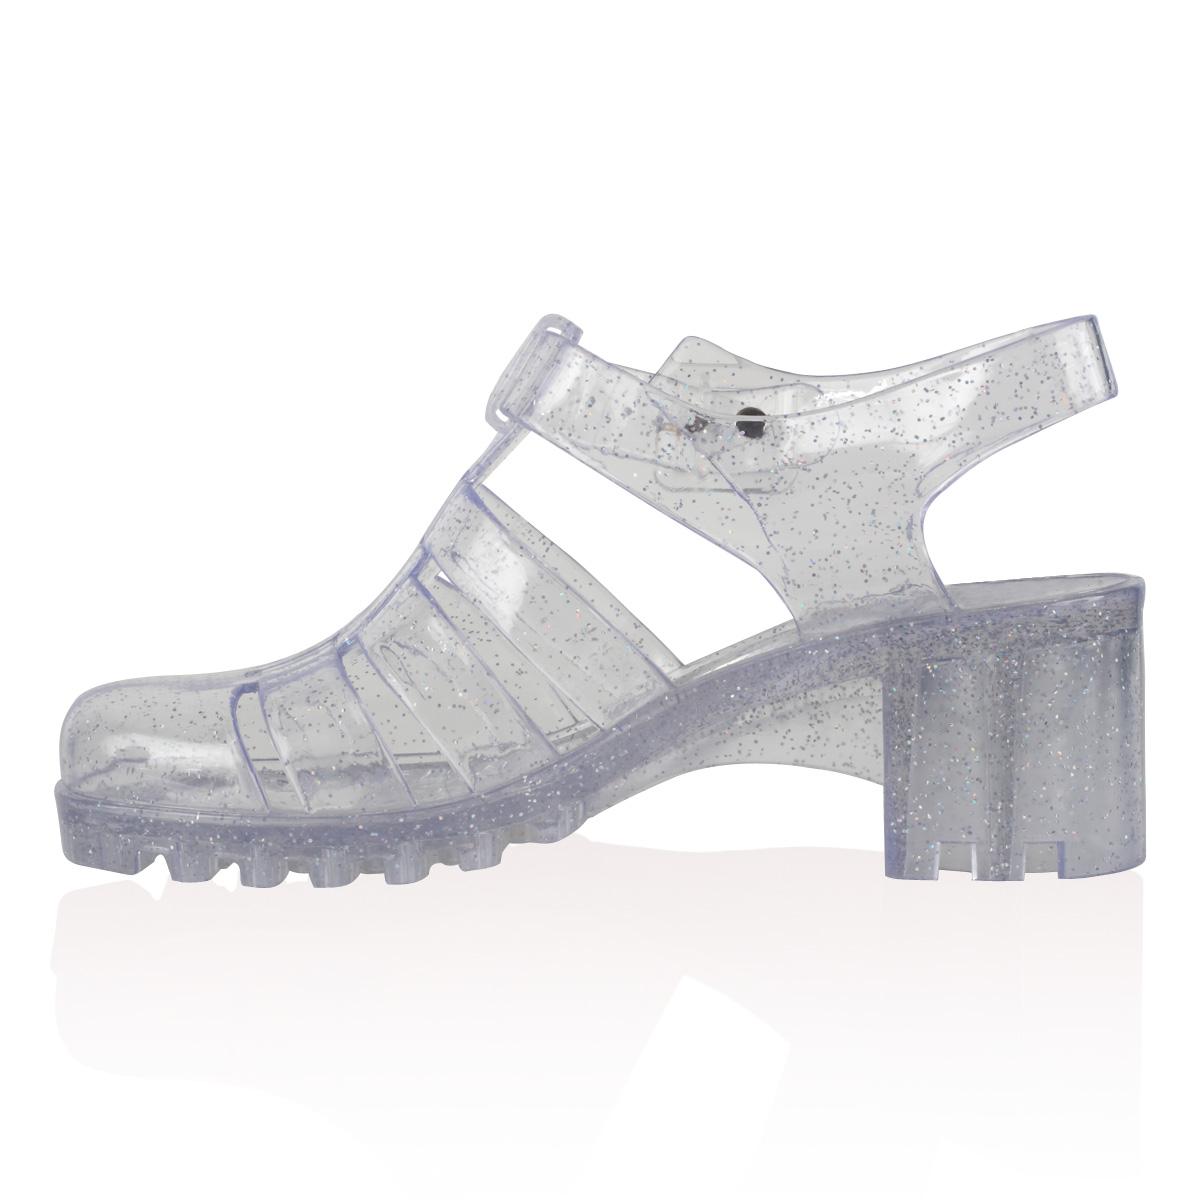 Ladies Jelly Womens Retro Beach Flip Flop Summer Heel Sandals Shoes Size 5 10 | eBay